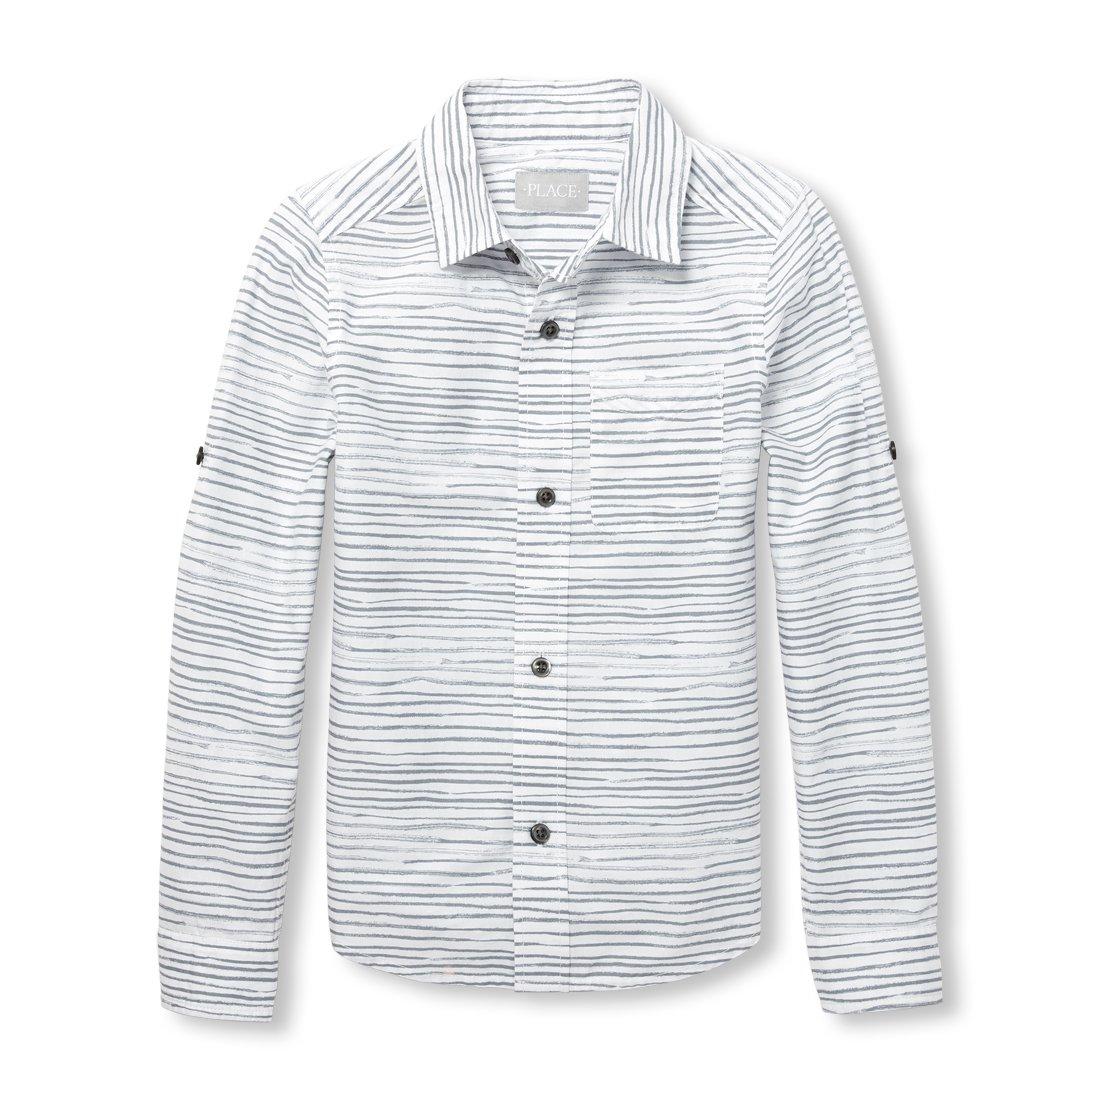 The Children's Place Big Boys' Printed Poplin Button Down Shirt